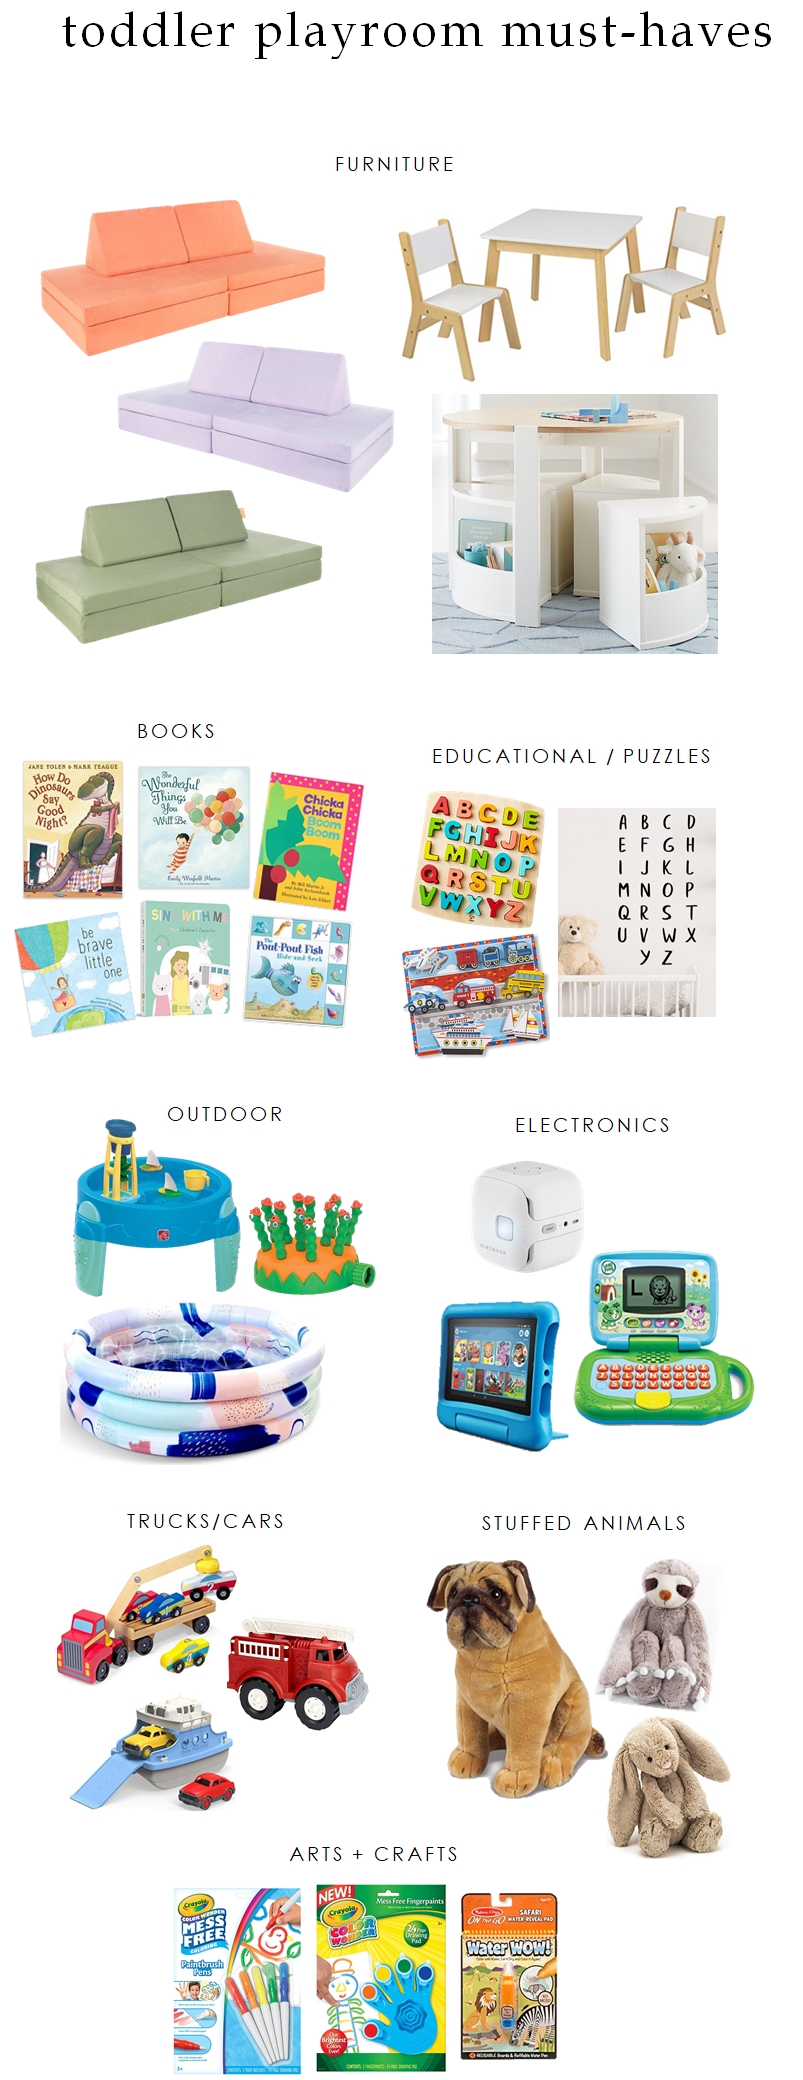 toddler-playroom-ideas-must-haves.jpg